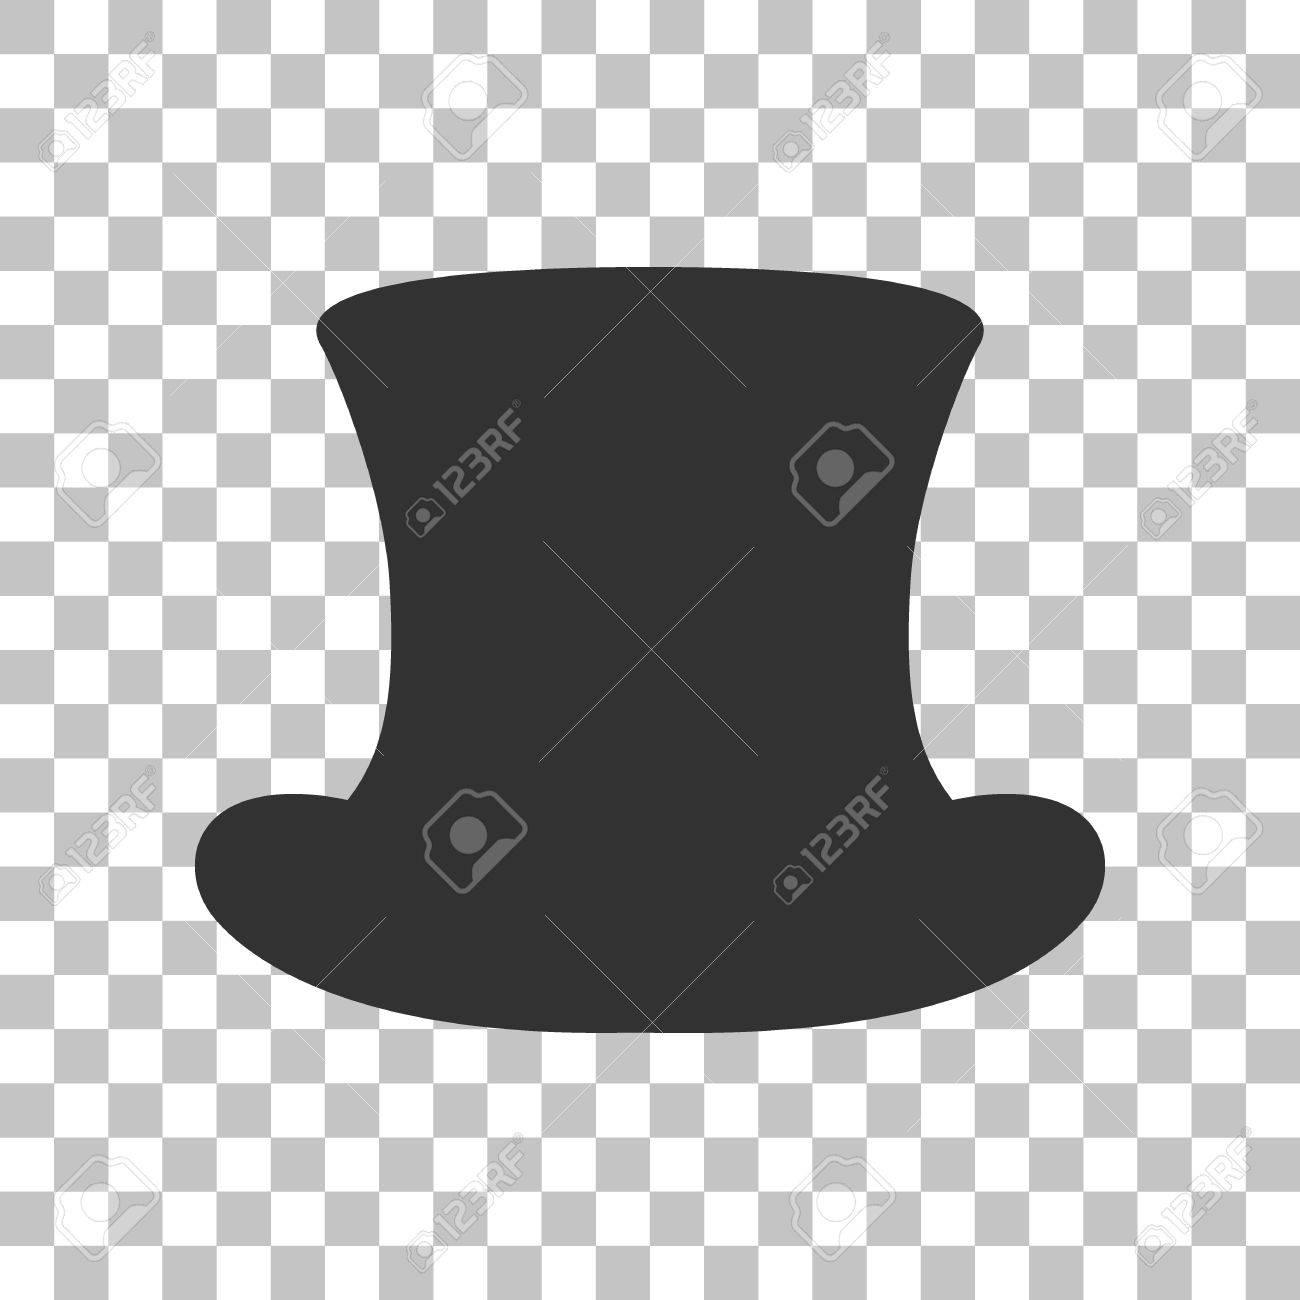 Top hat sign. Dark gray icon on transparent background. Stock Vector -  59063833 887cf41eefe